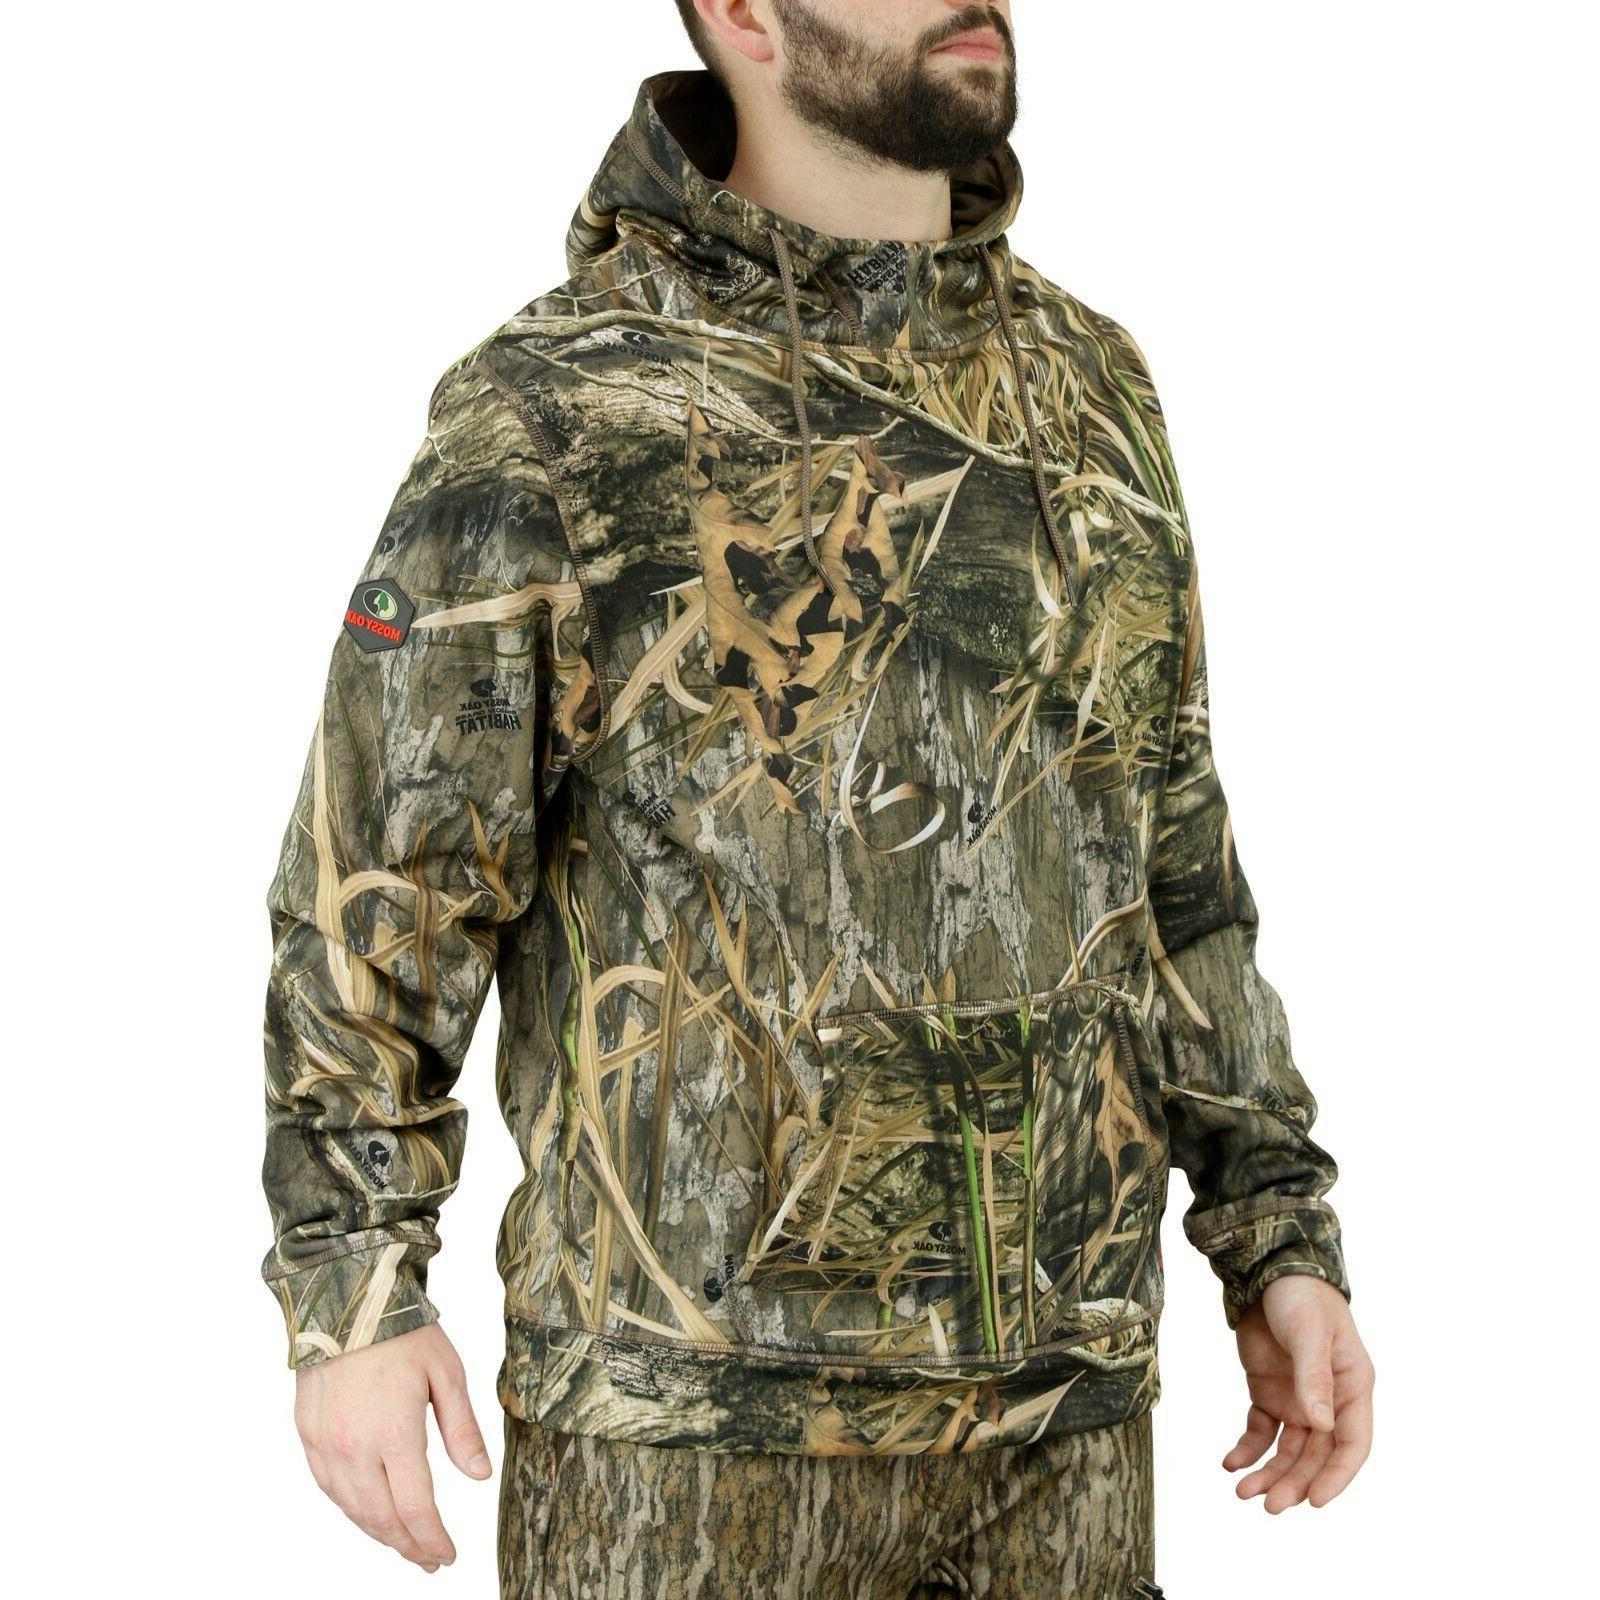 Mossy Oak Fleece Camo Clothes